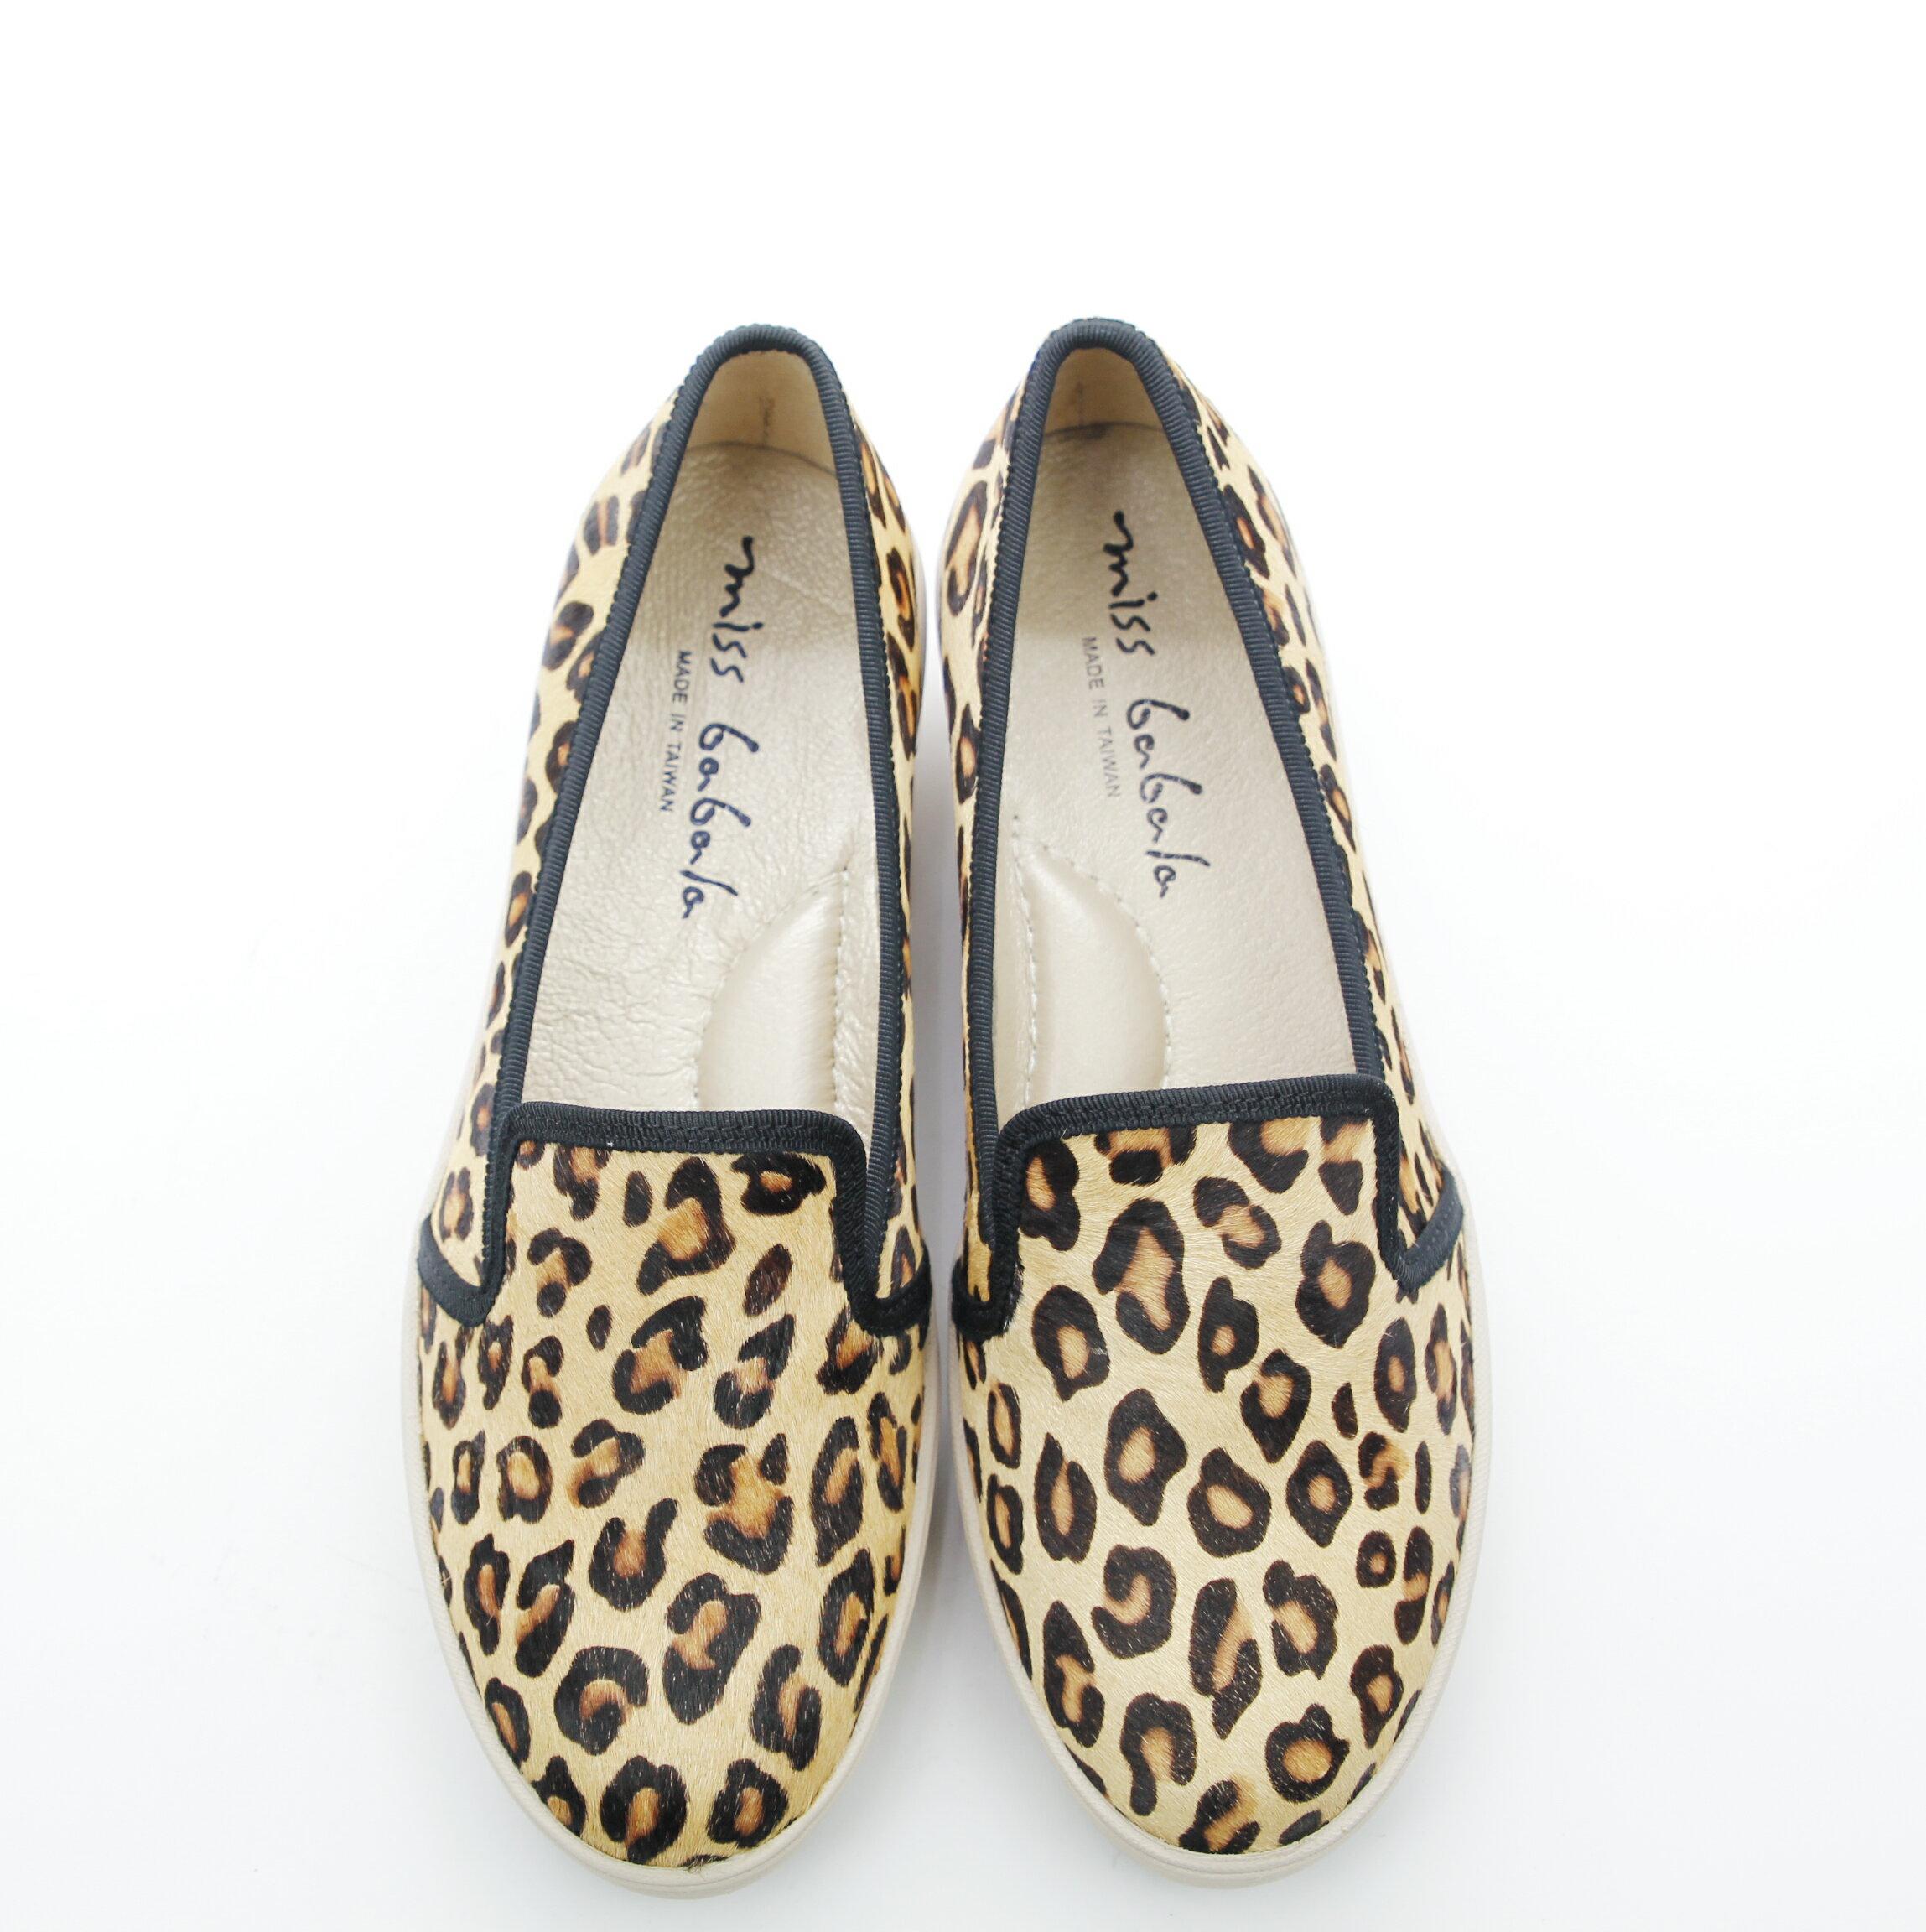 Aimez La Vie 超輕氣墊鞋|豹紋馬毛真皮內裡腳窩墊樂福厚底休閒鞋